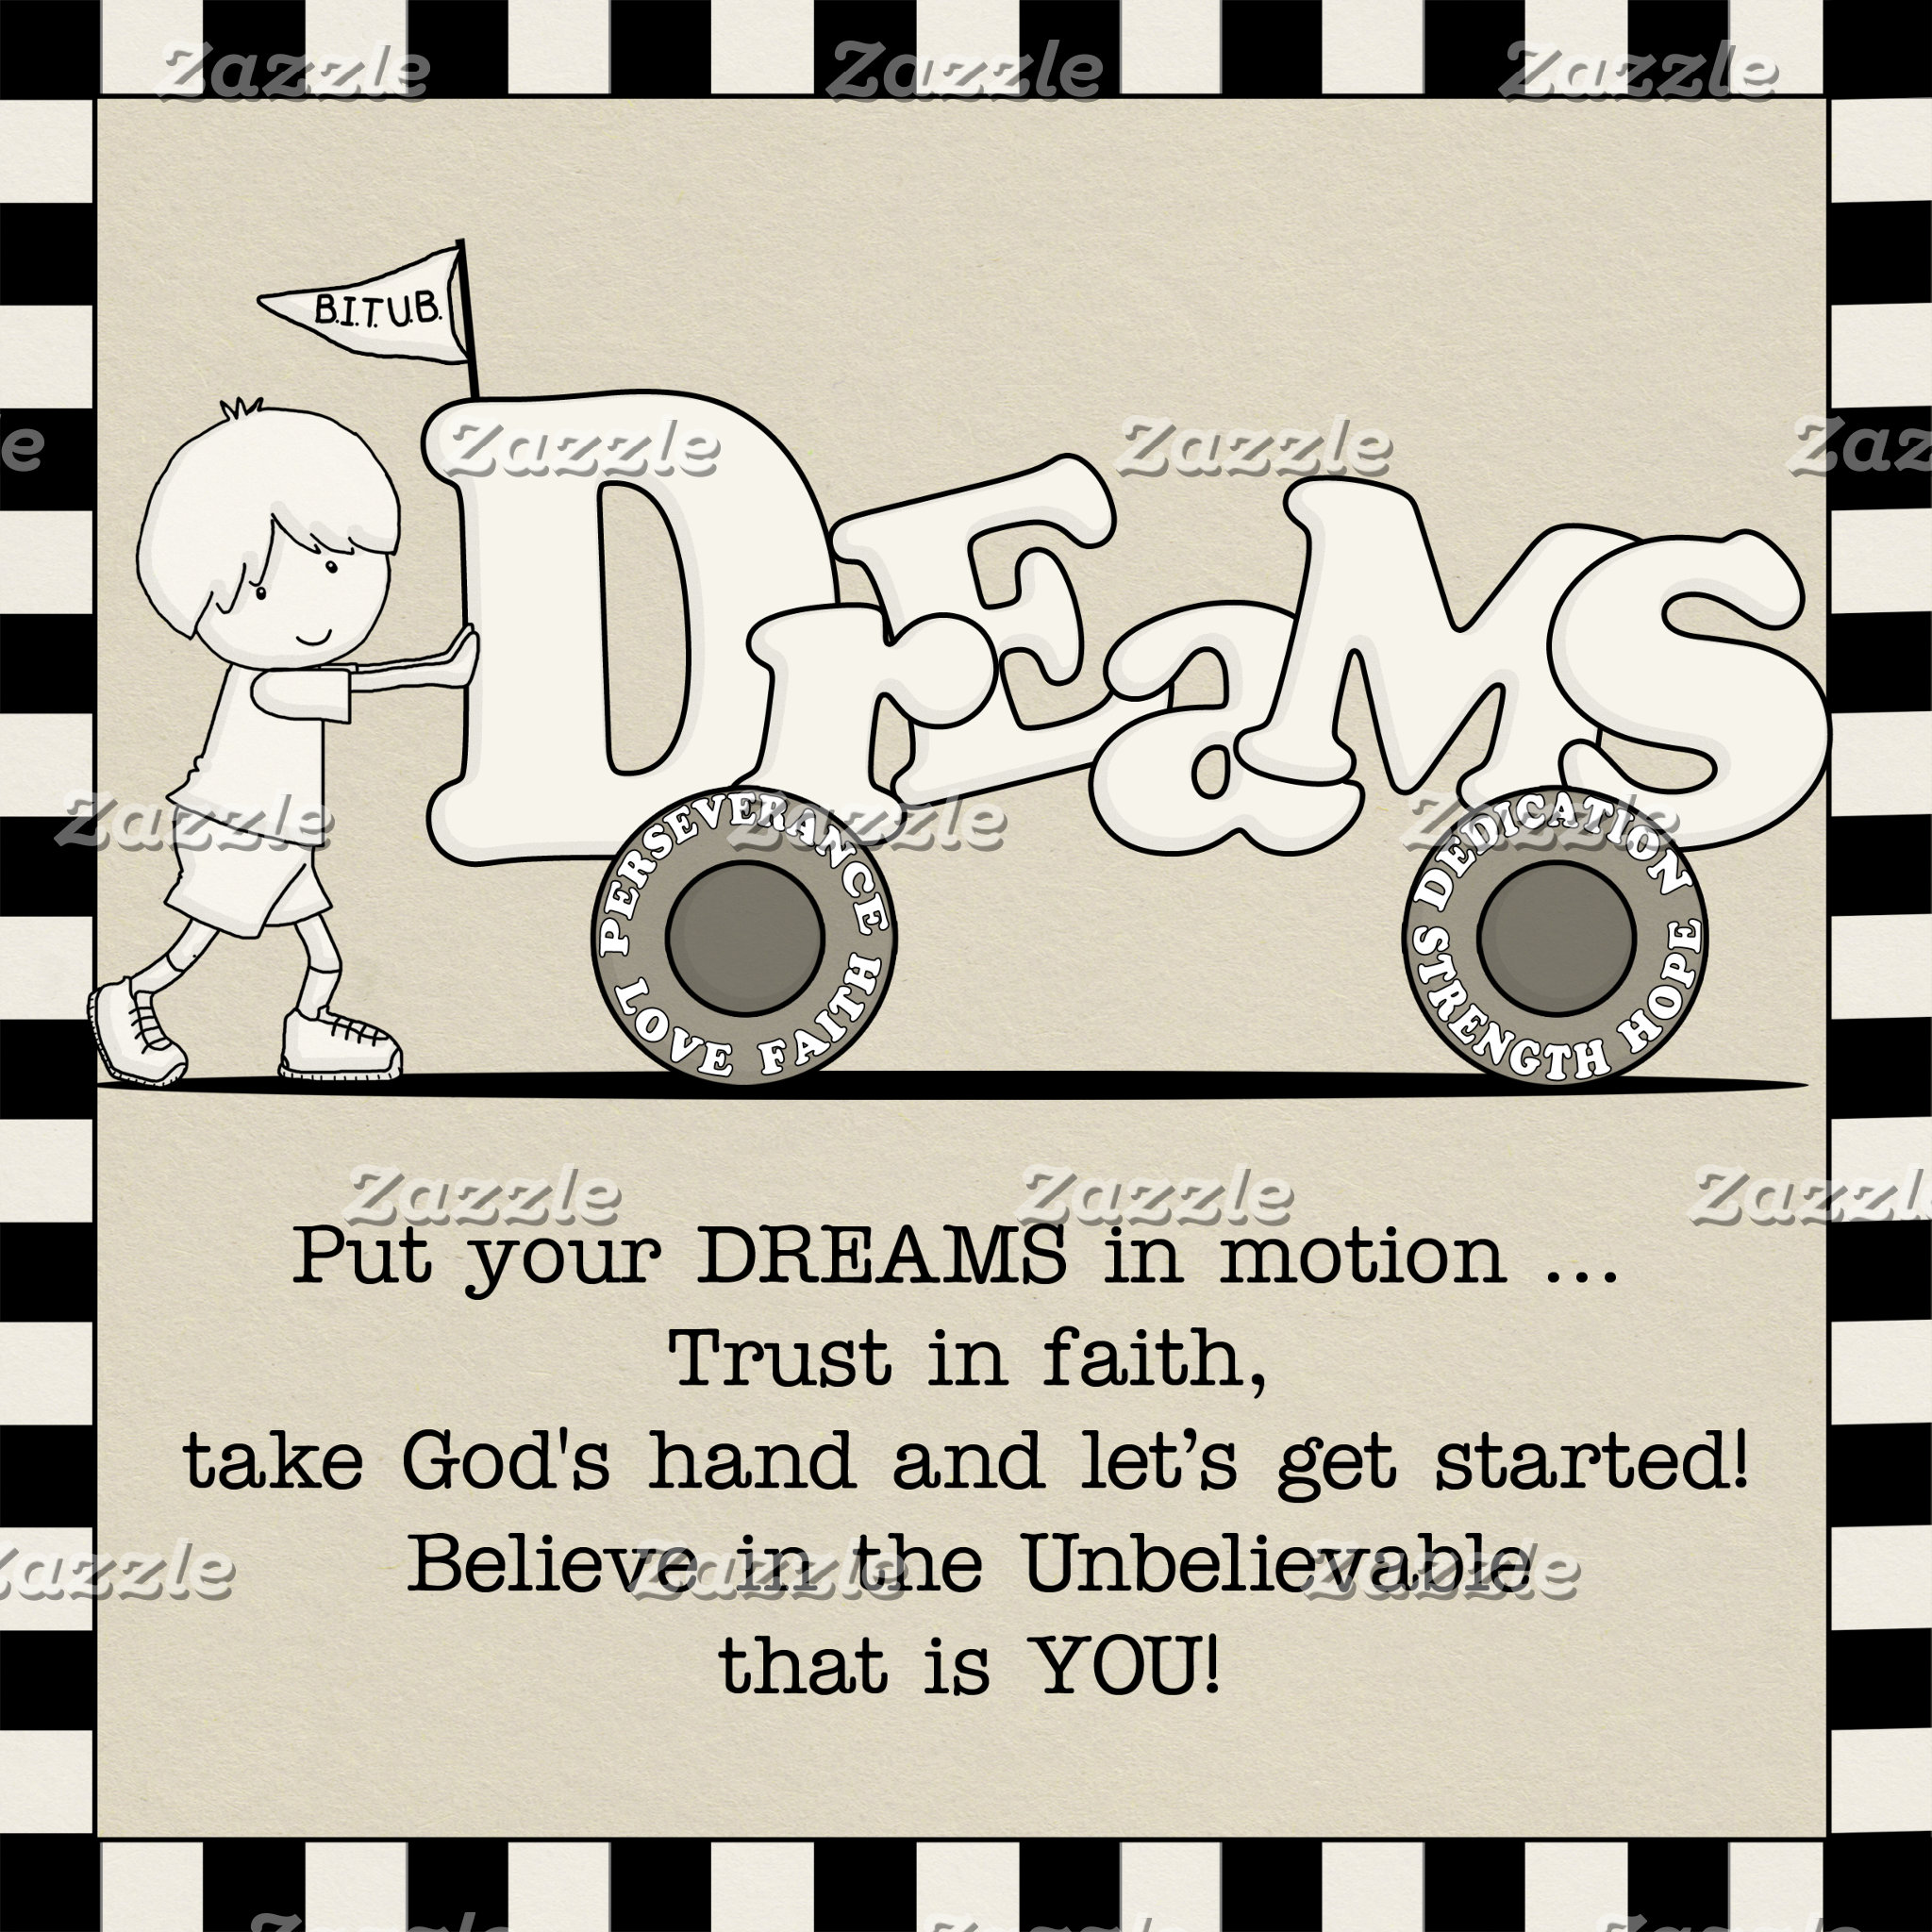 Dreams in Motion